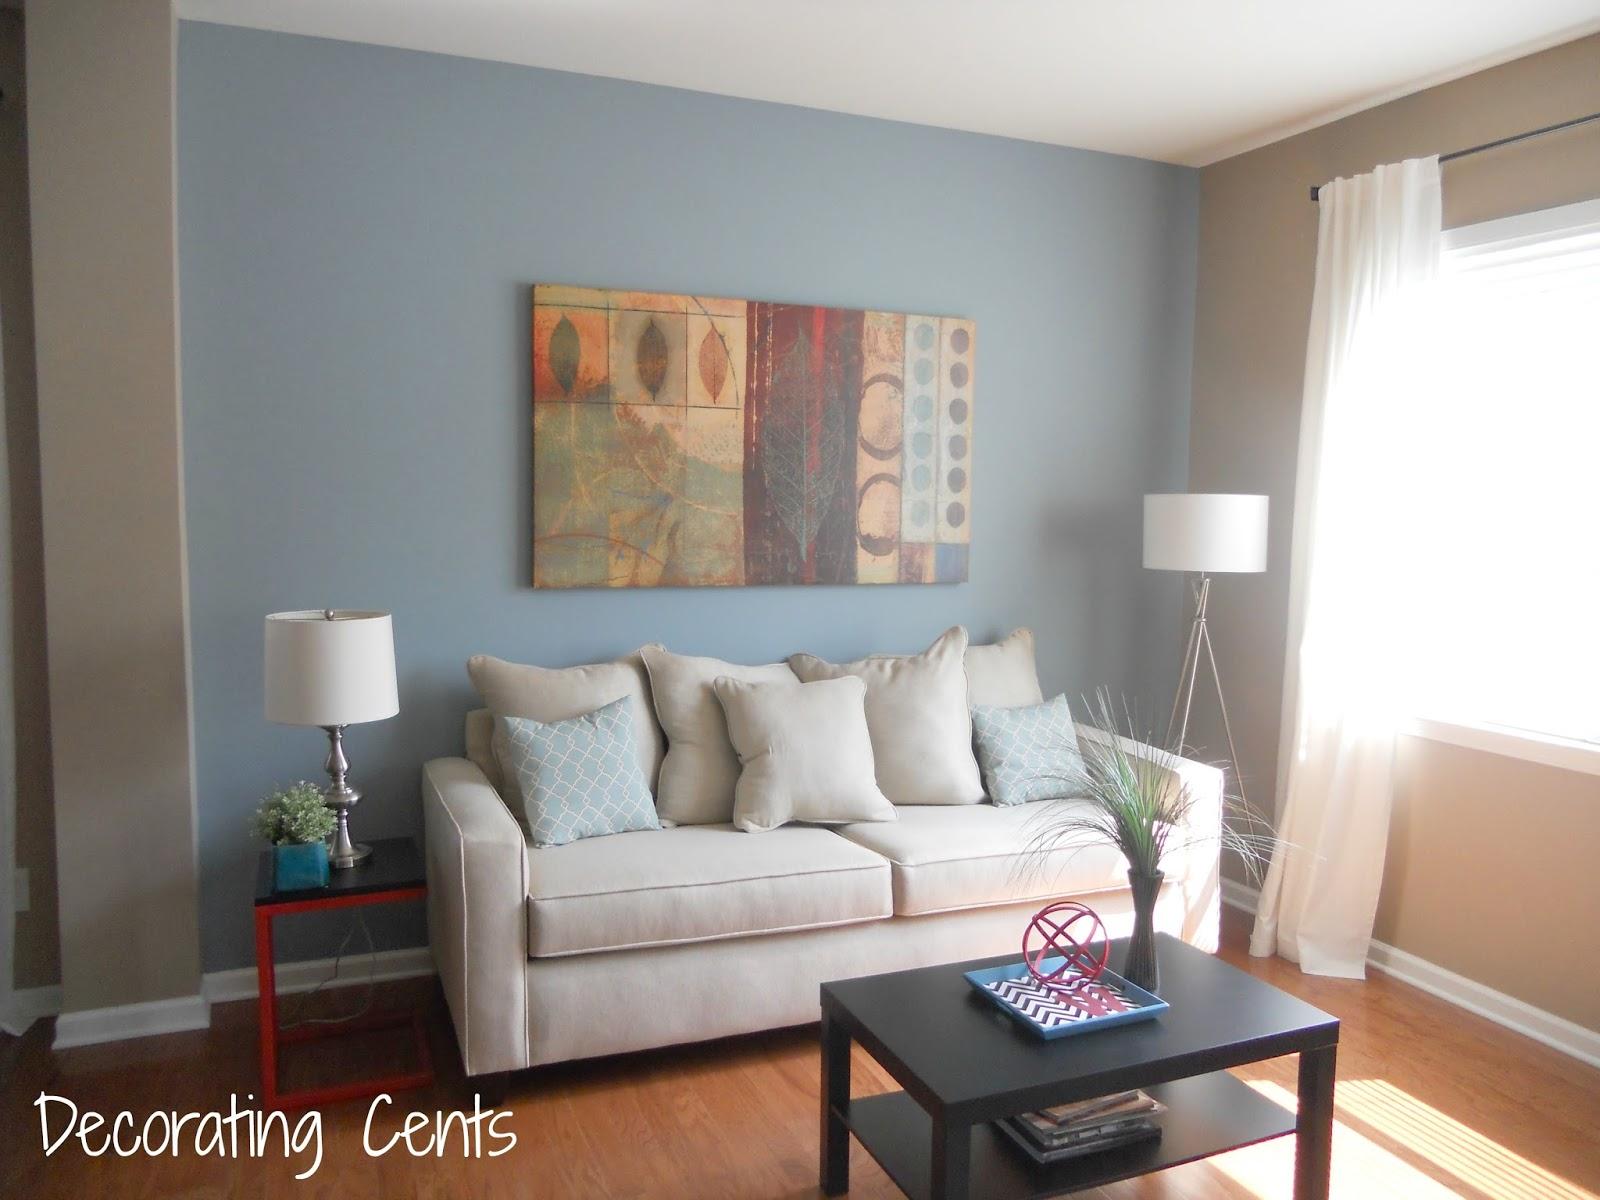 Decorating Cents: Color Change